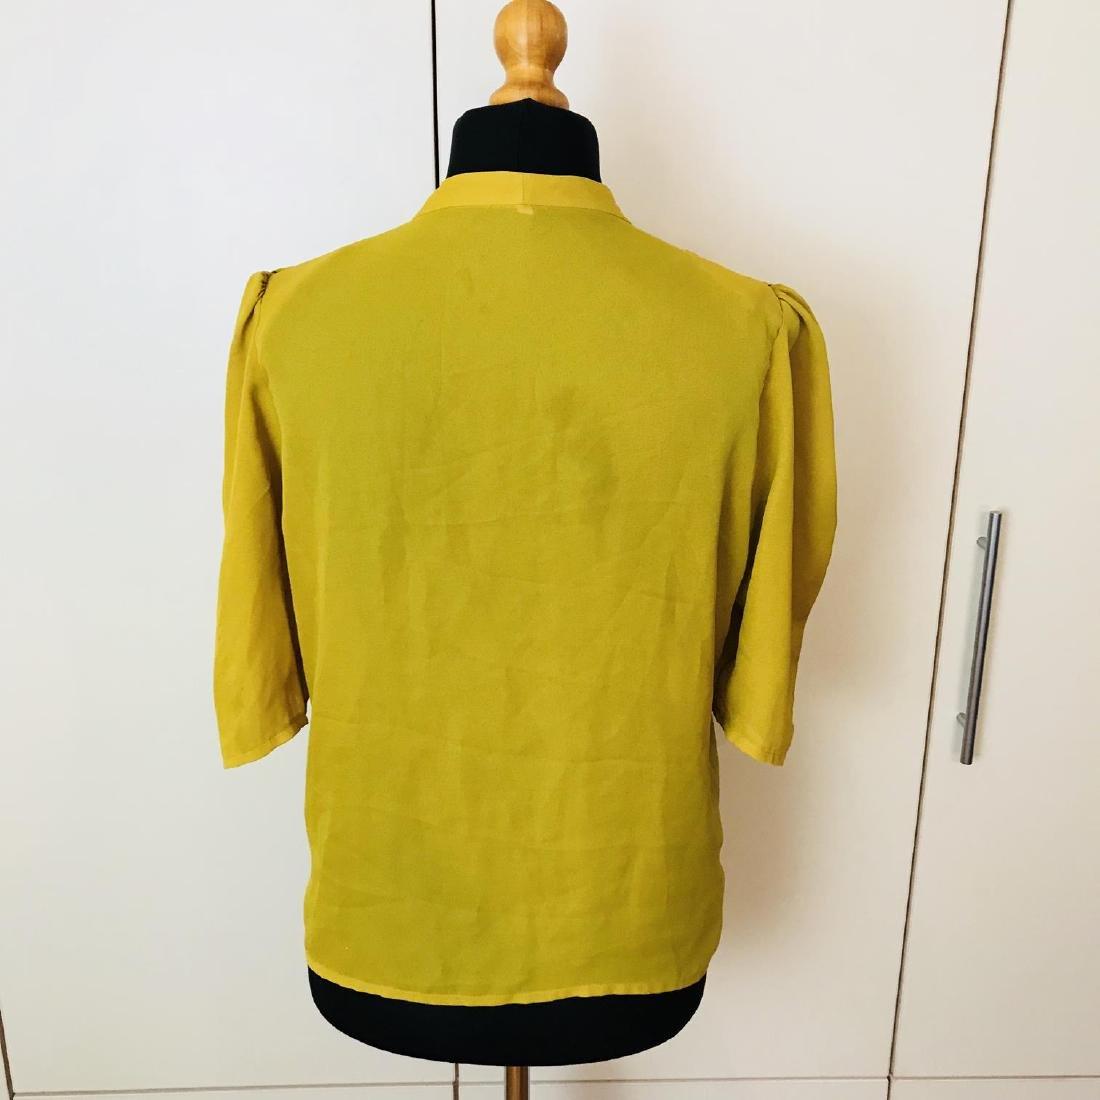 Vintage Women's Yellow Blouse Shirt Top Size EUR 40 US - 4